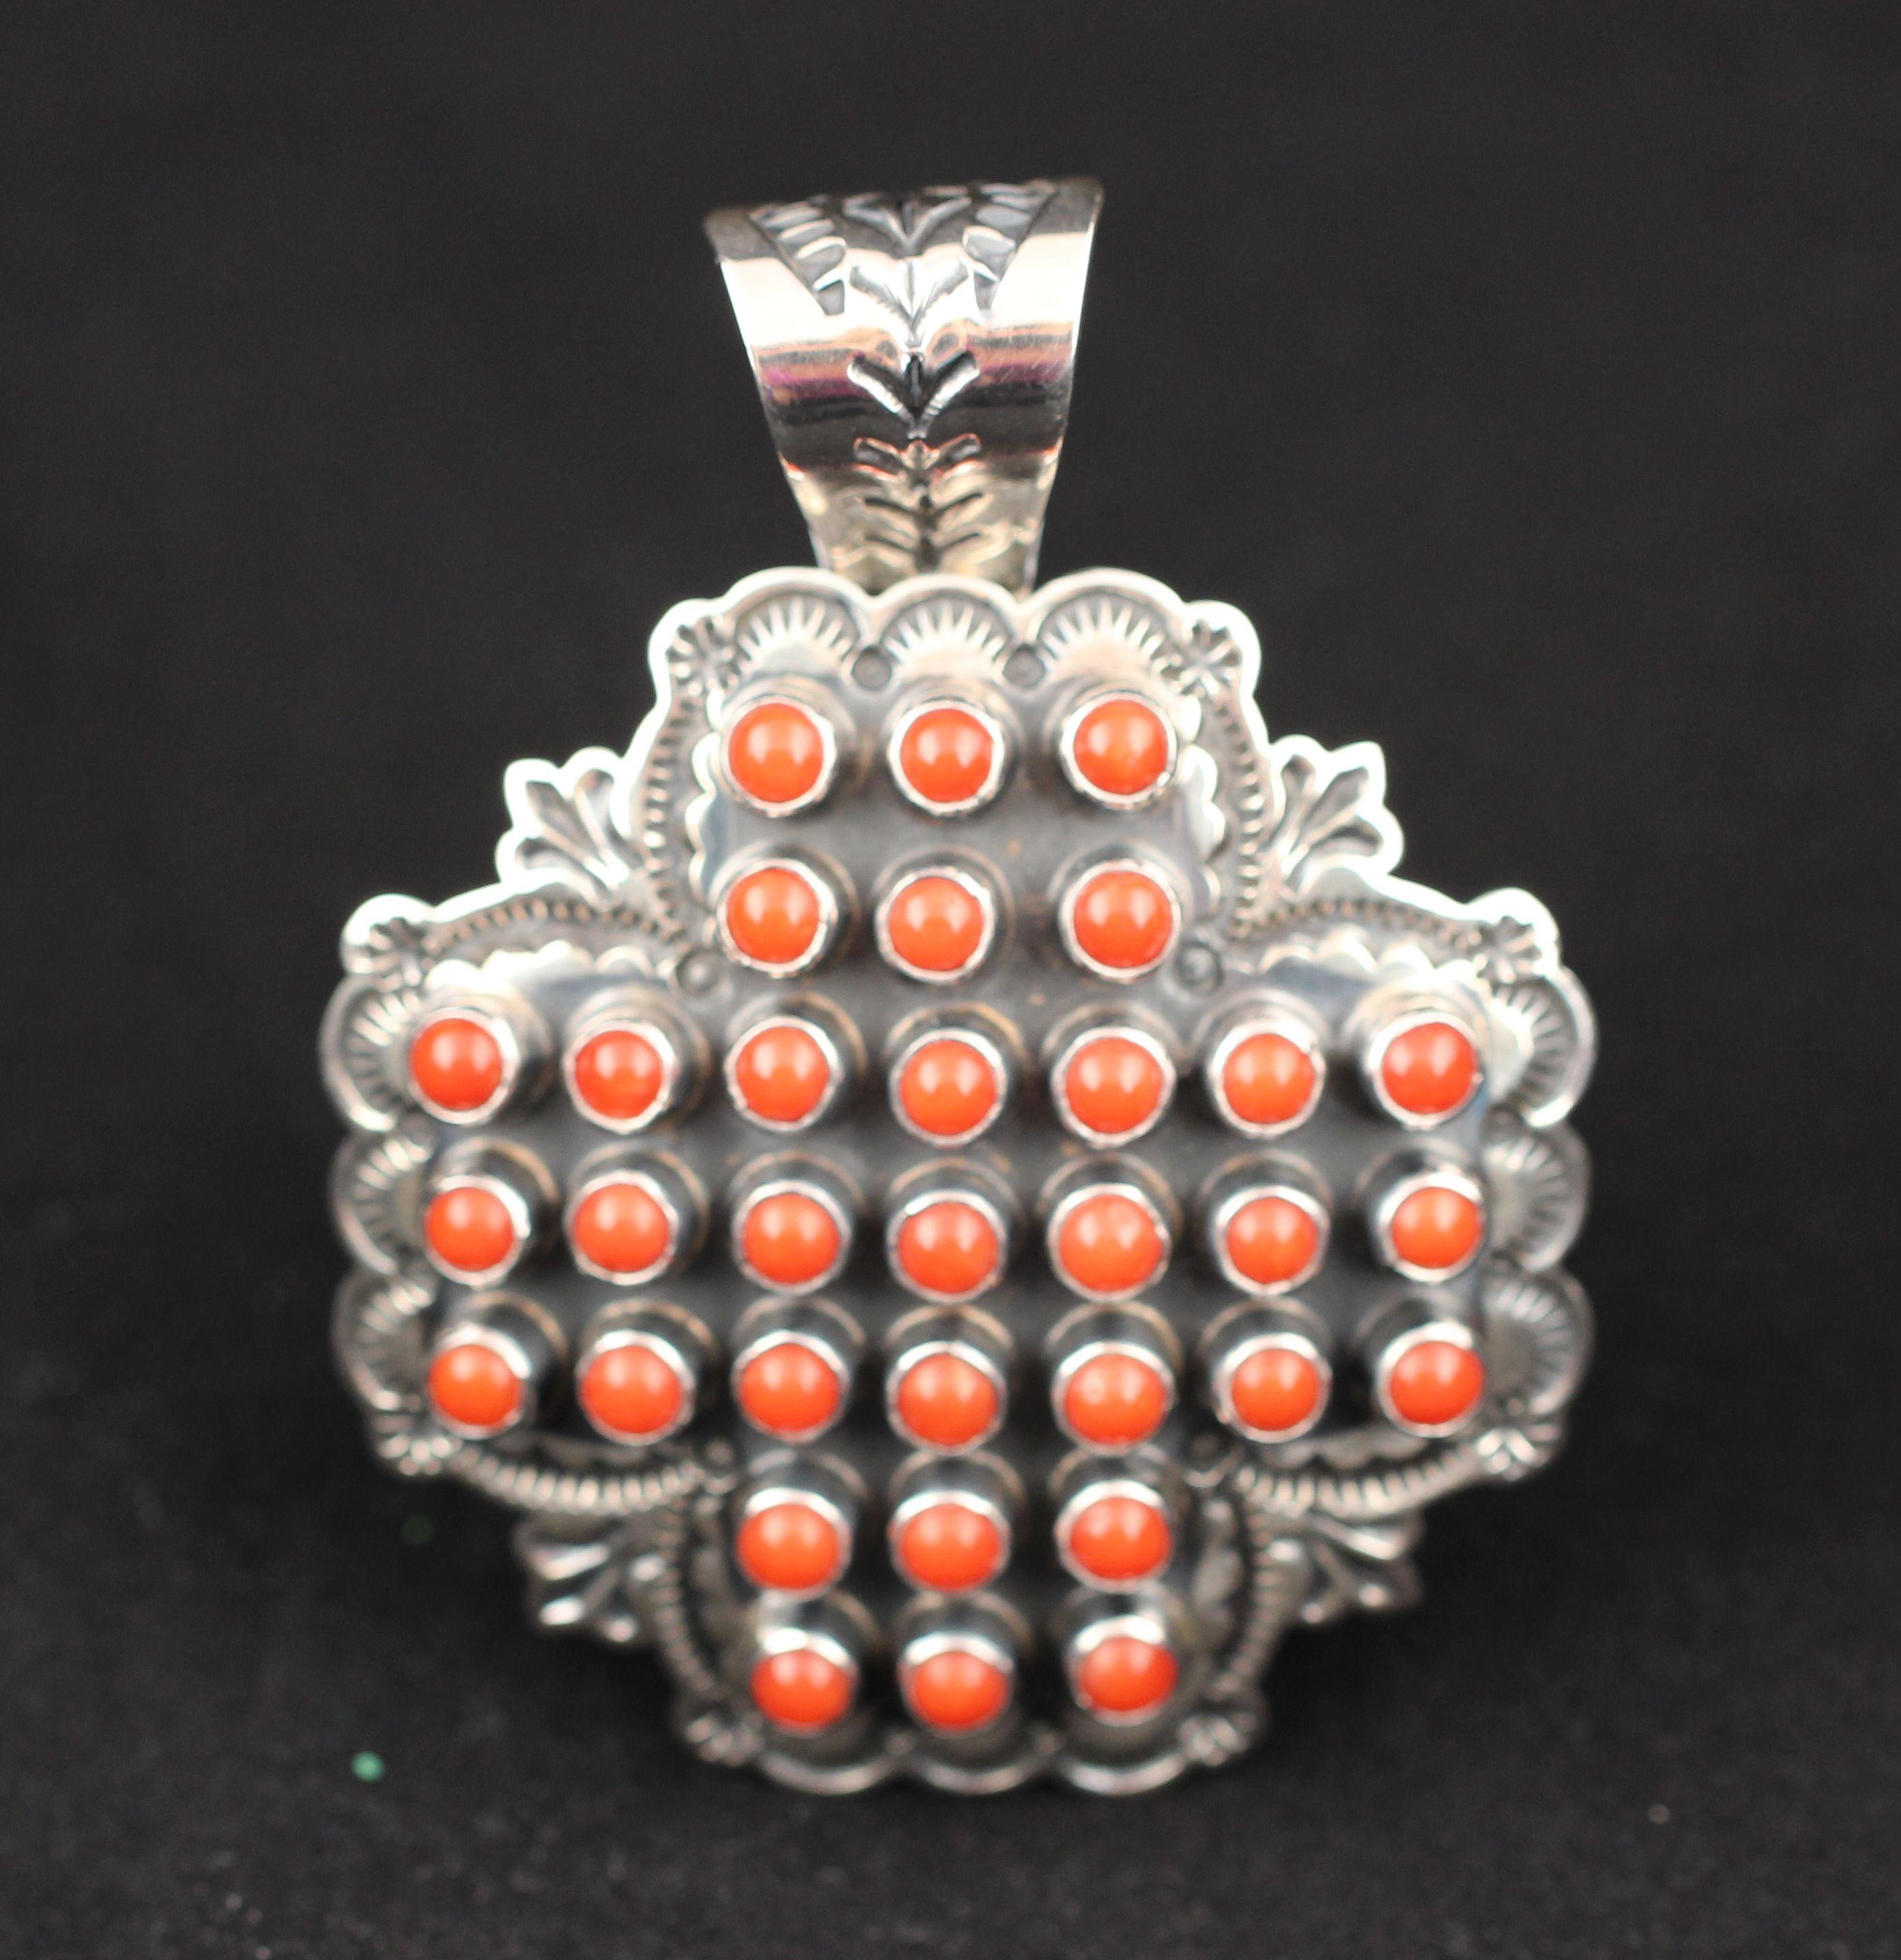 Sunshine Reeves Pendant.   #nativeamericanjewelry    #coraljewelry http://www.leotasindianart.com/